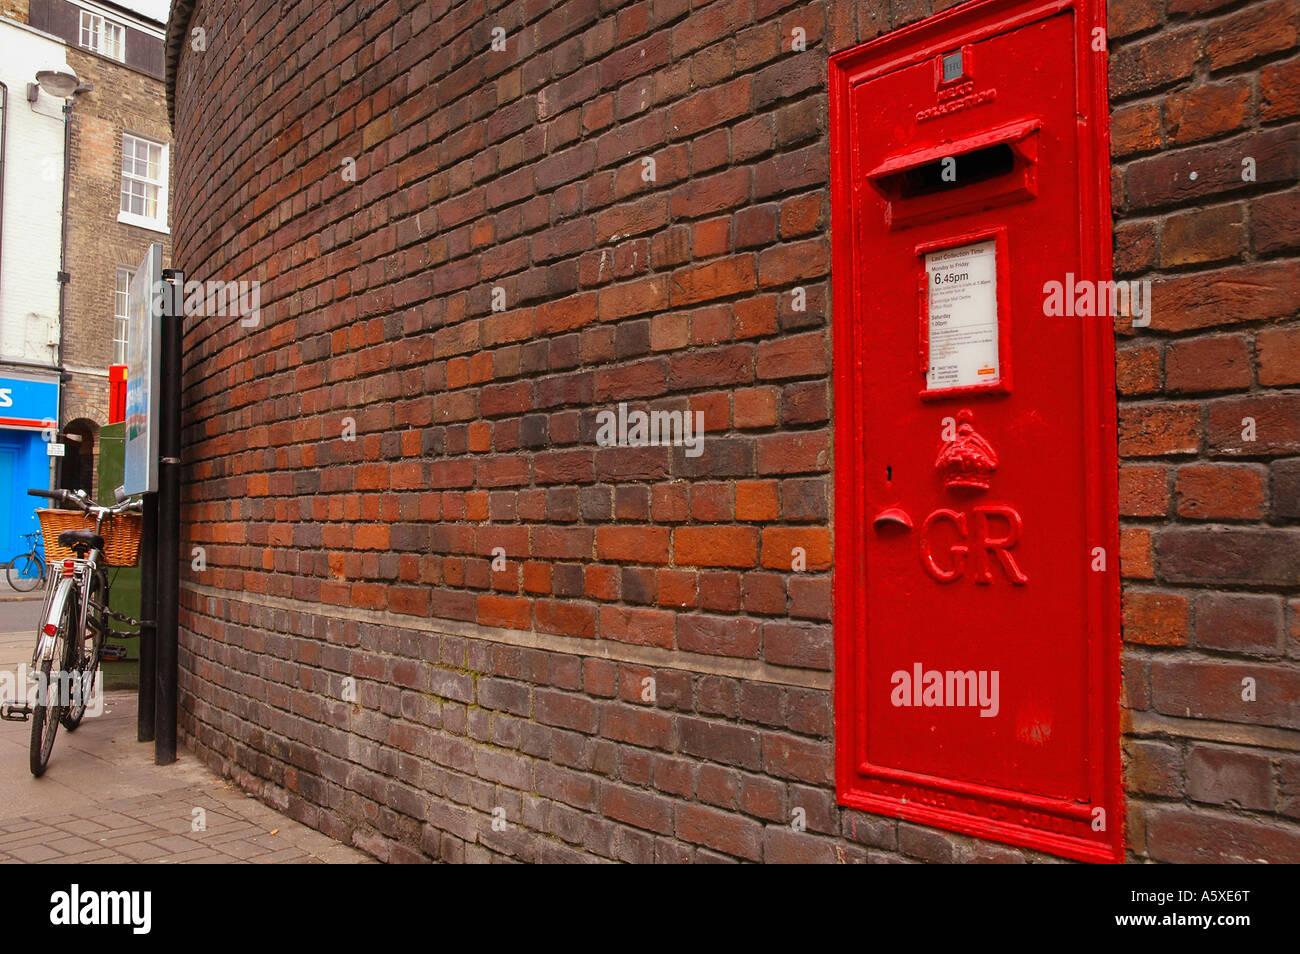 Painet iw1900 england cambridge university jesus lane brick wall mailbox sidney sussex college - Stock Image